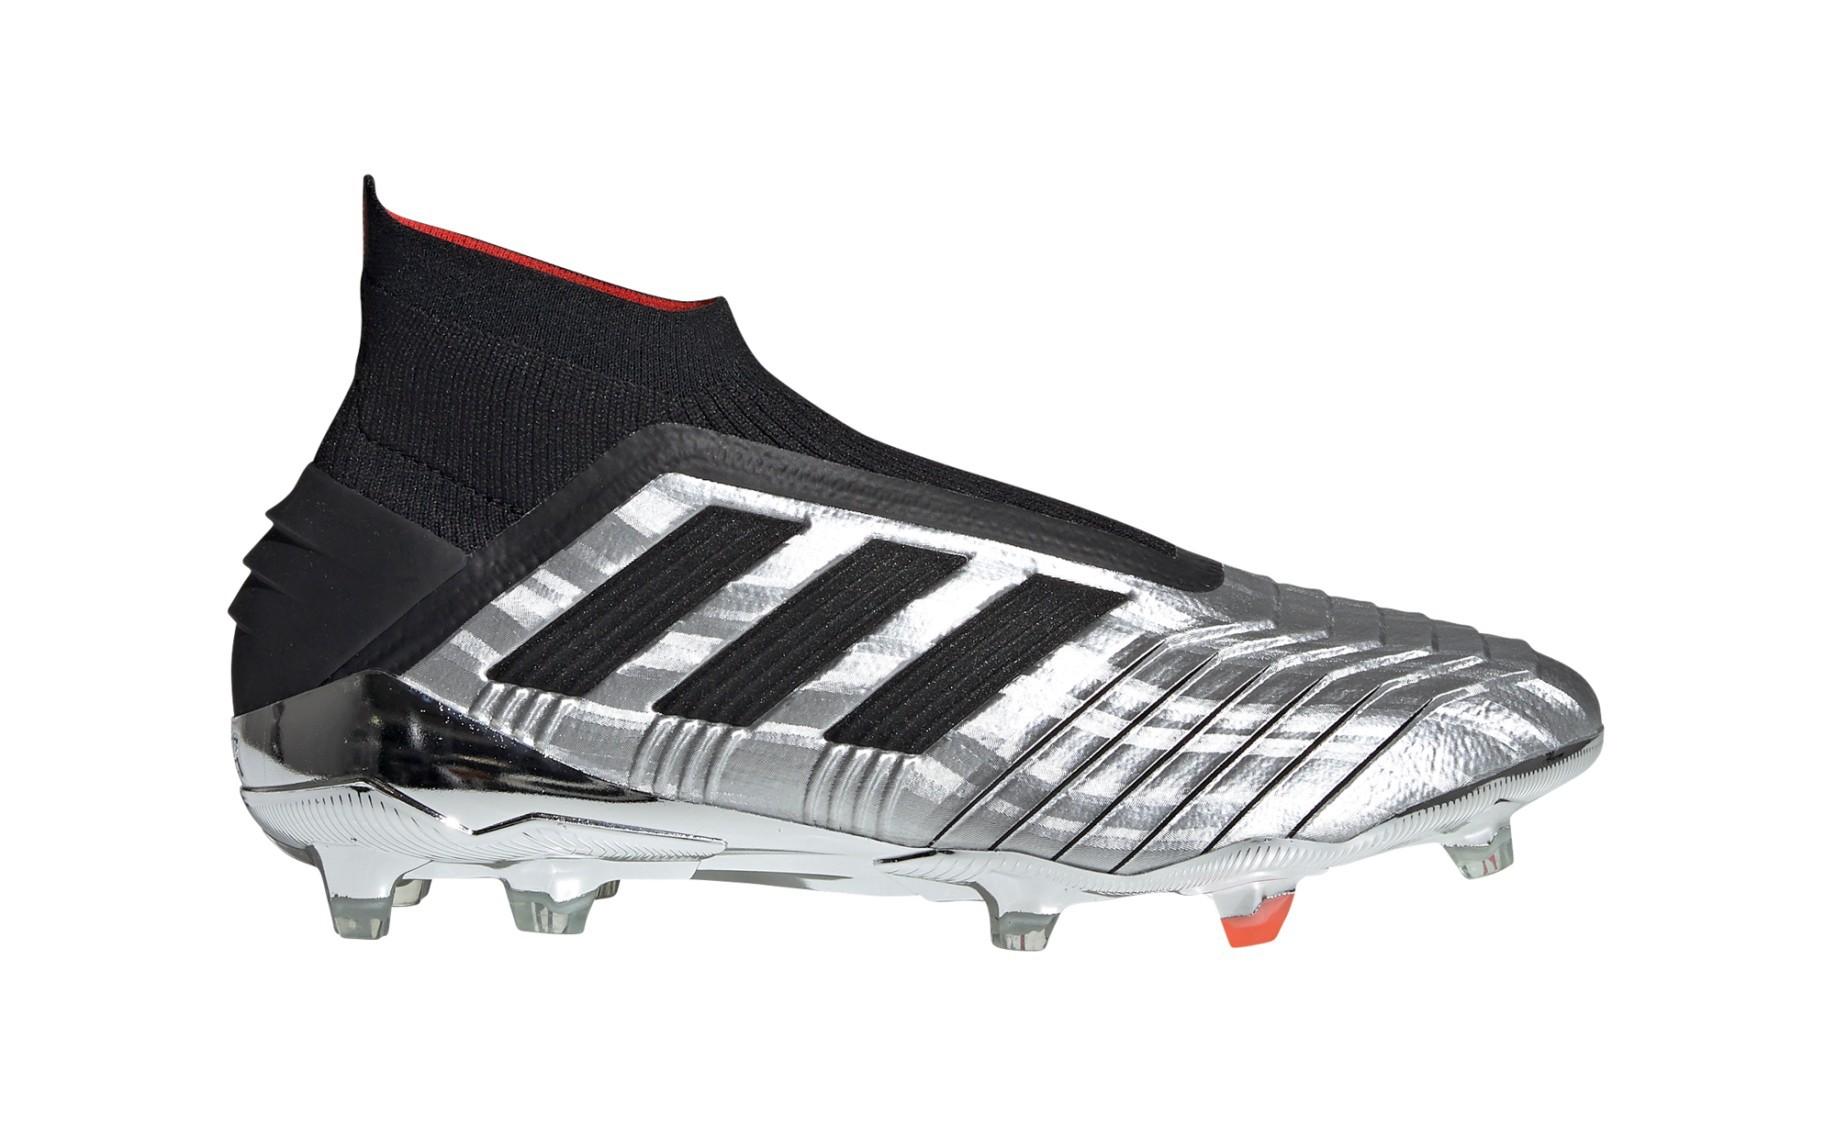 96bca2e4cd Botas de Fútbol Adidas Predator 19+ FG Redirección 302 Pack colore plata  negro - Adidas - SportIT.com